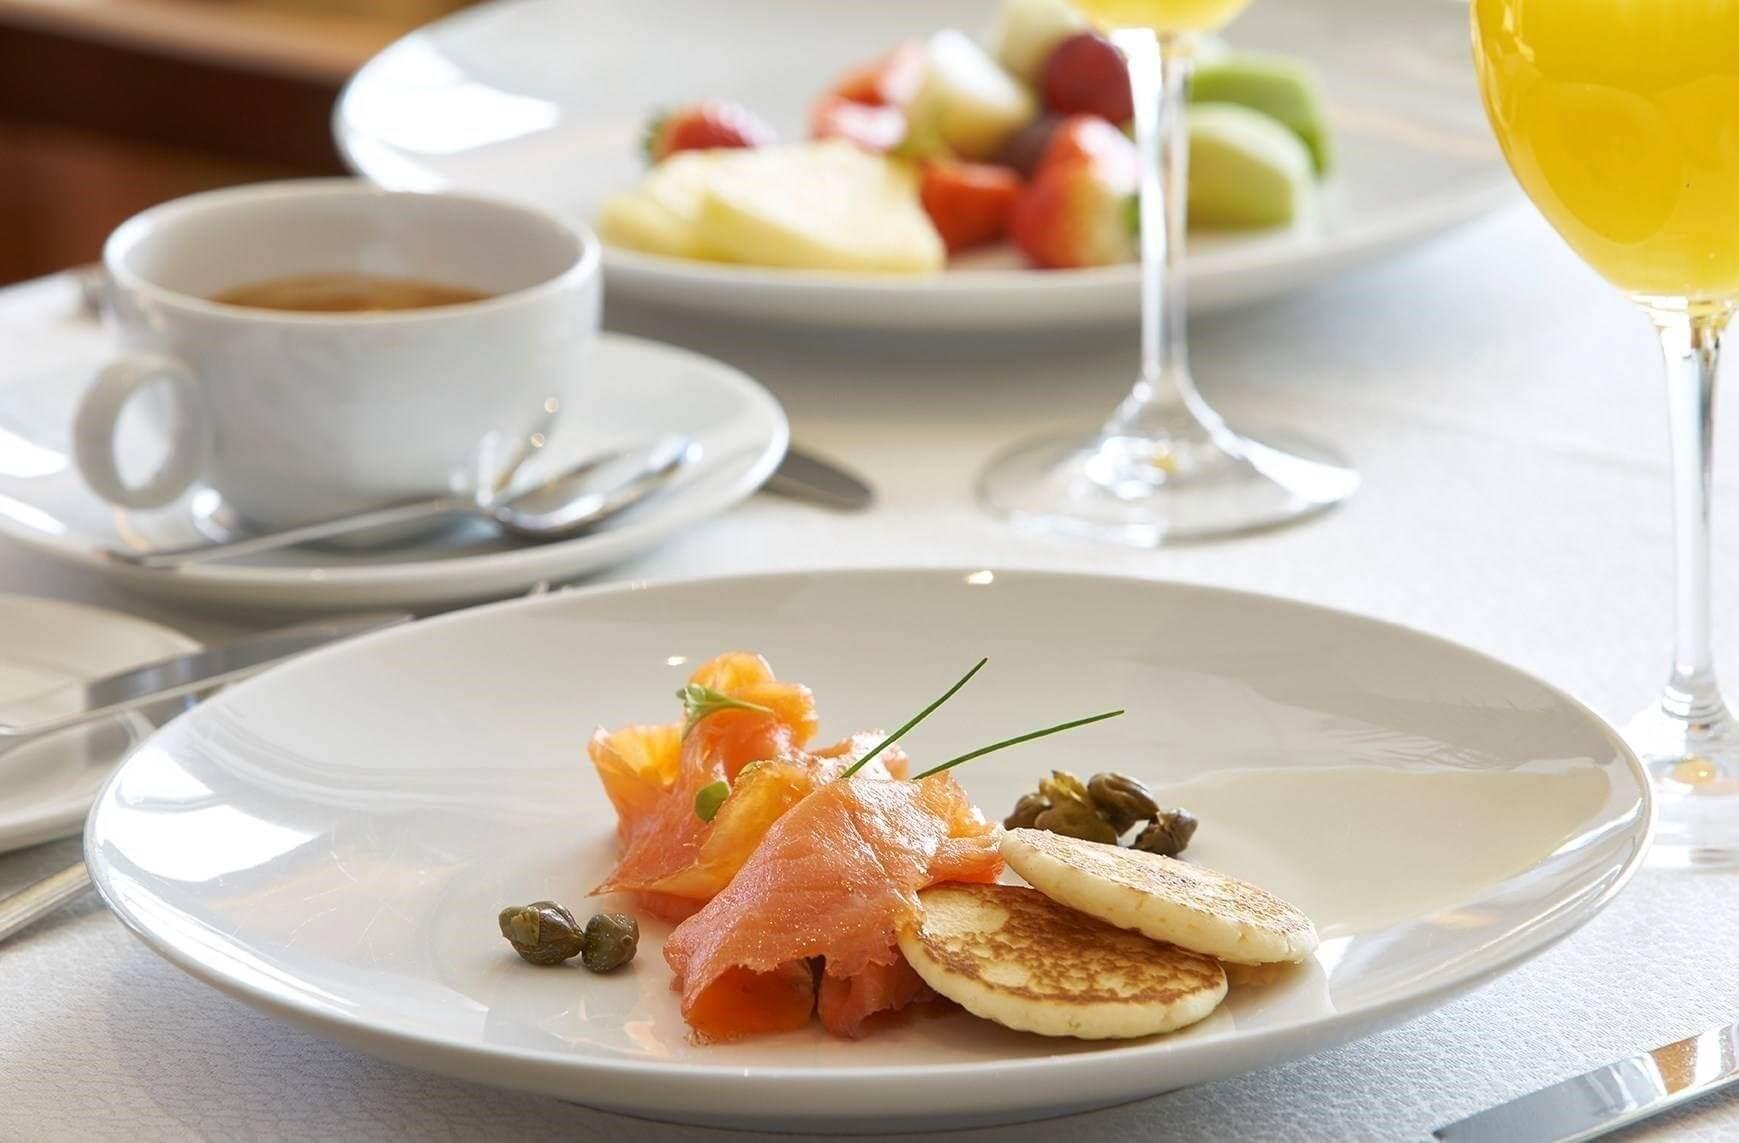 PortoBay Liberdade - Bistro4 Breakfast